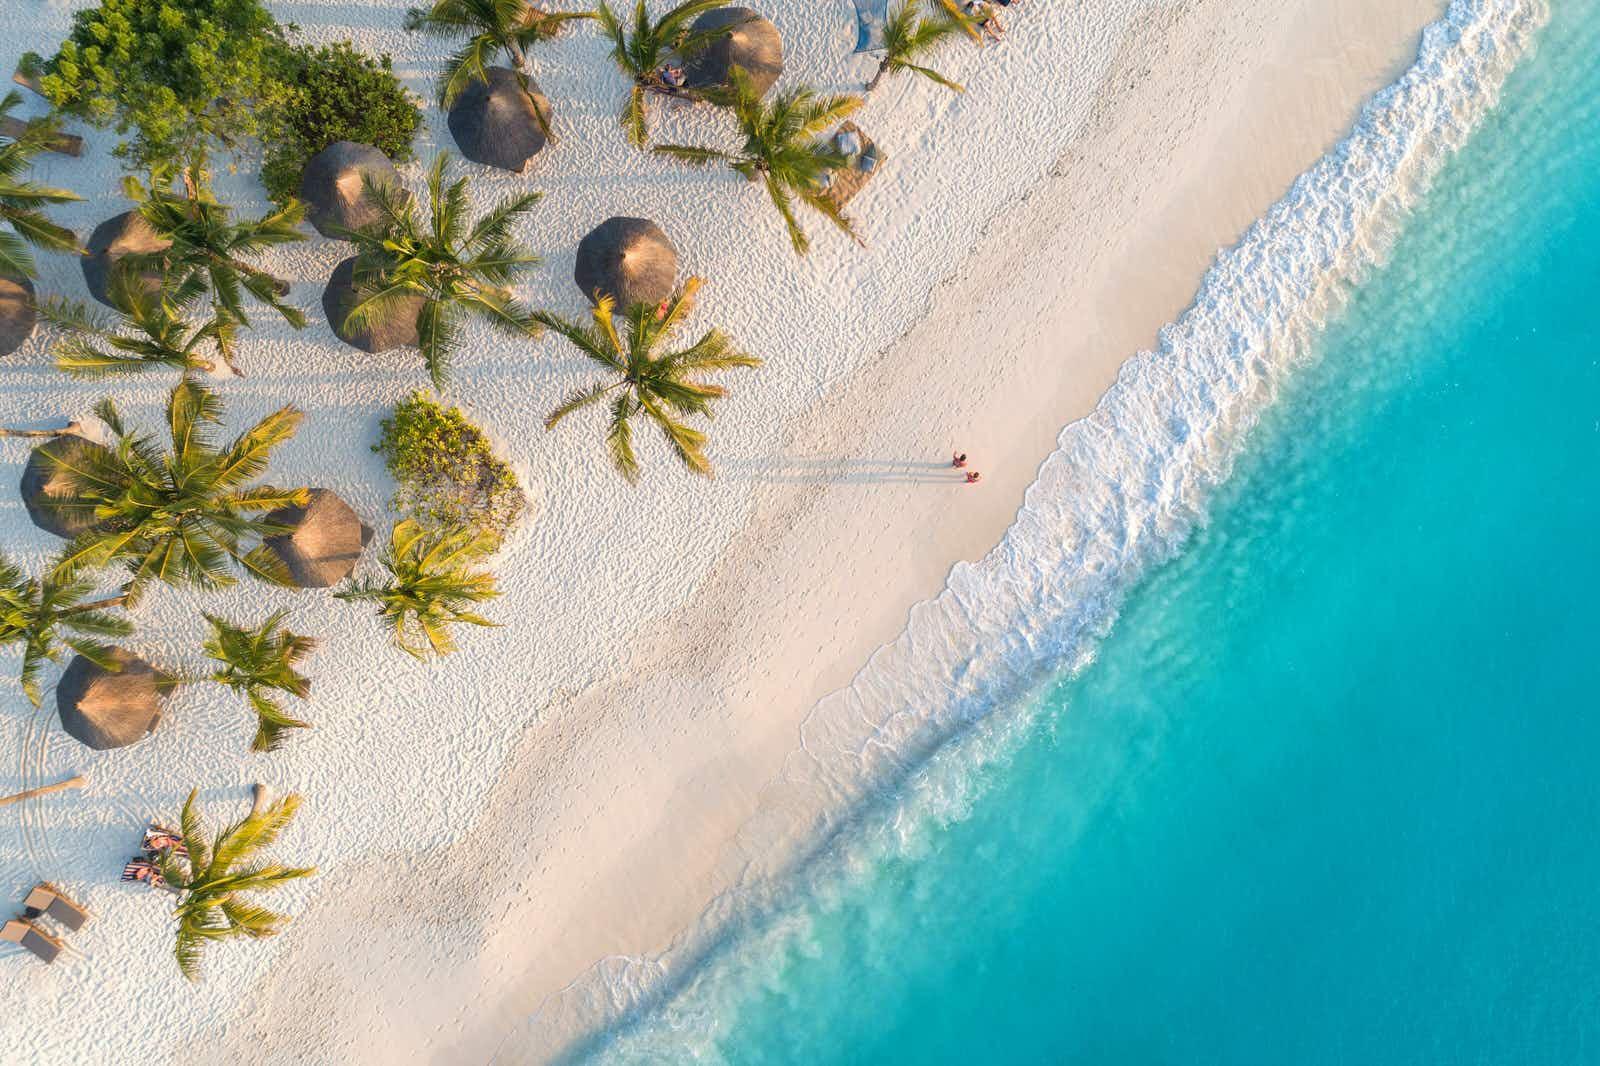 Zanzibar's coast is a picture perfect palette of tropical beach bliss © Den-Belitsky / Getty Images